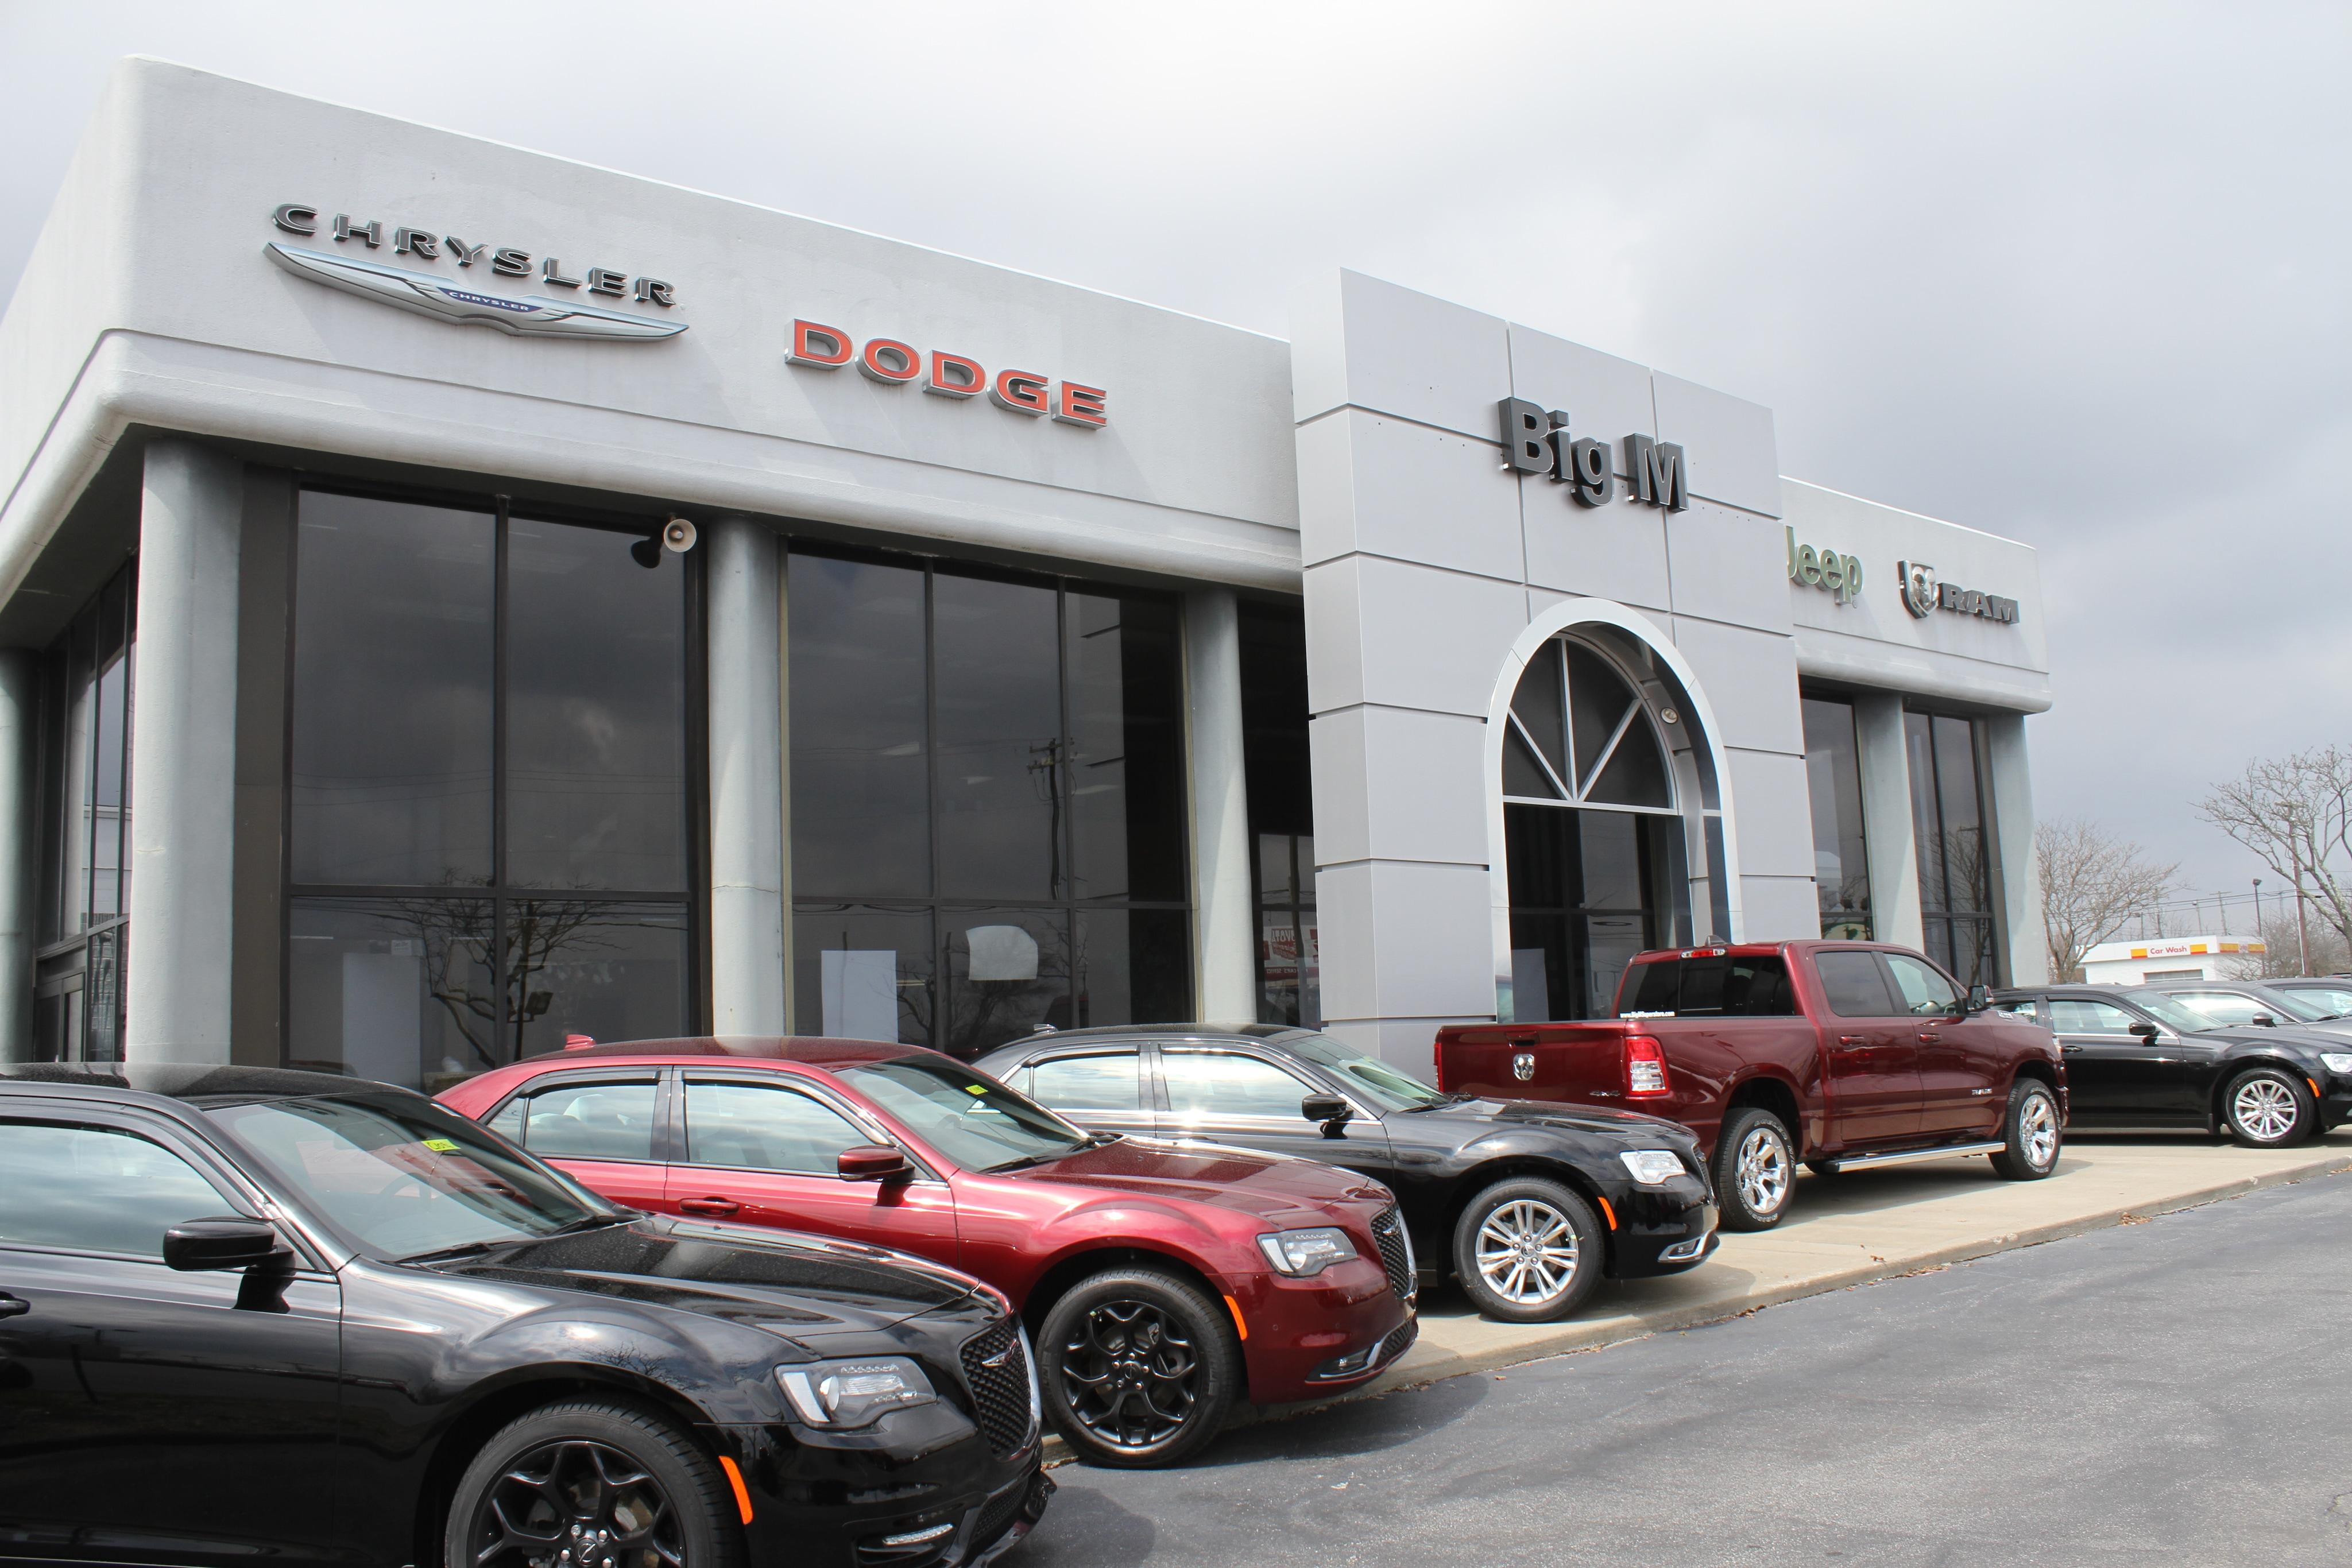 Big M Chrysler >> About Big M Chrysler Dodge Jeep Ram In Nicholasville